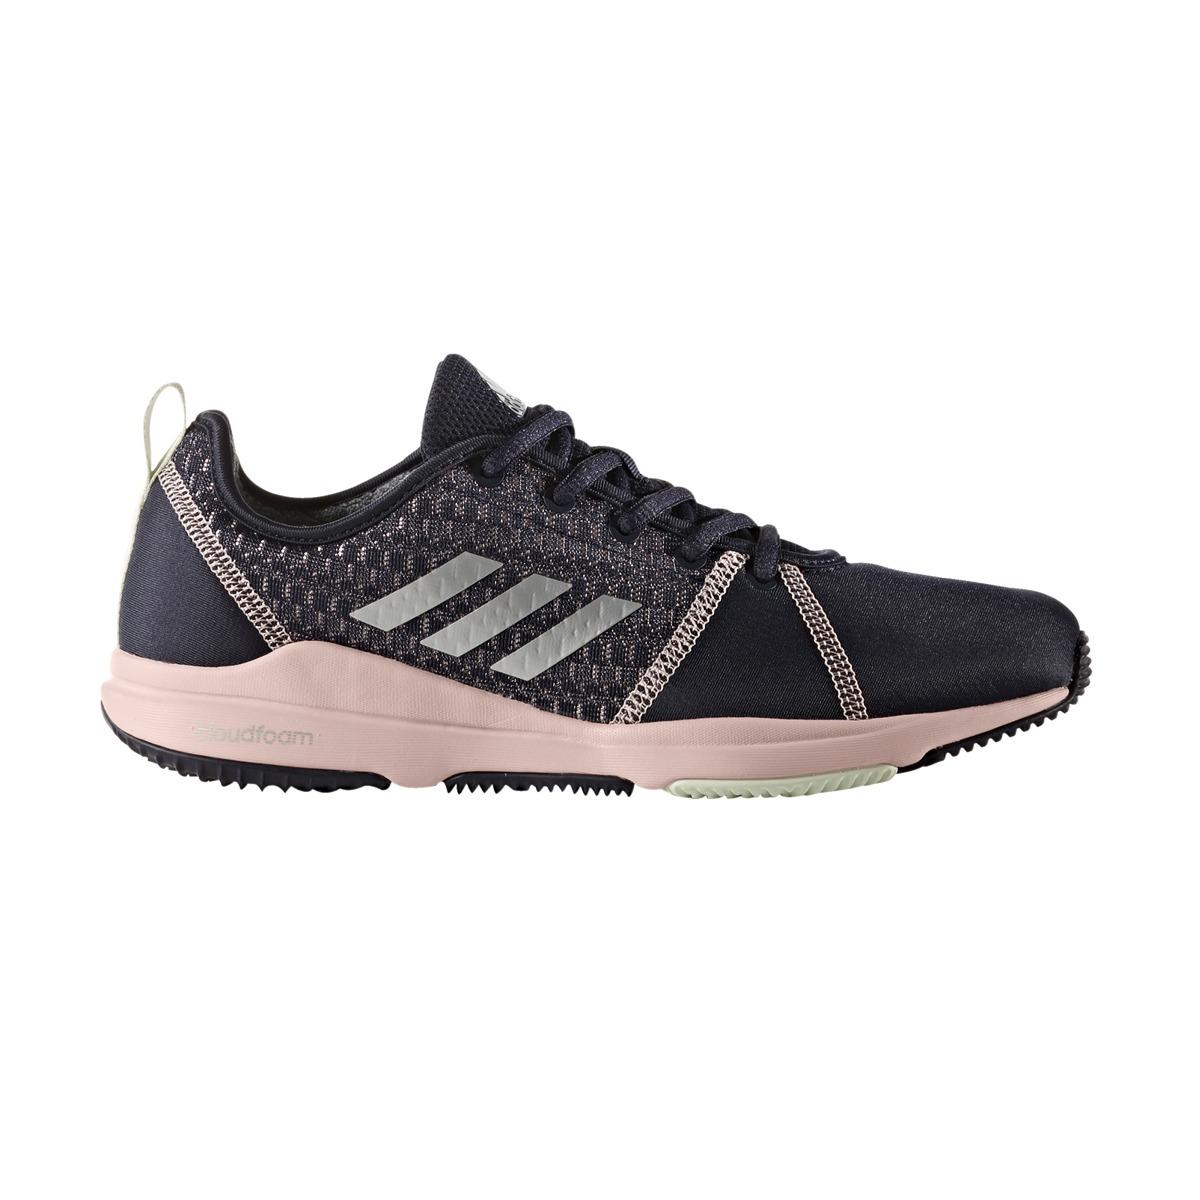 new product 8d3c0 0fd2f zapatillas adidas training arianna cloudfoam mujer mn rv. Cargando zoom.